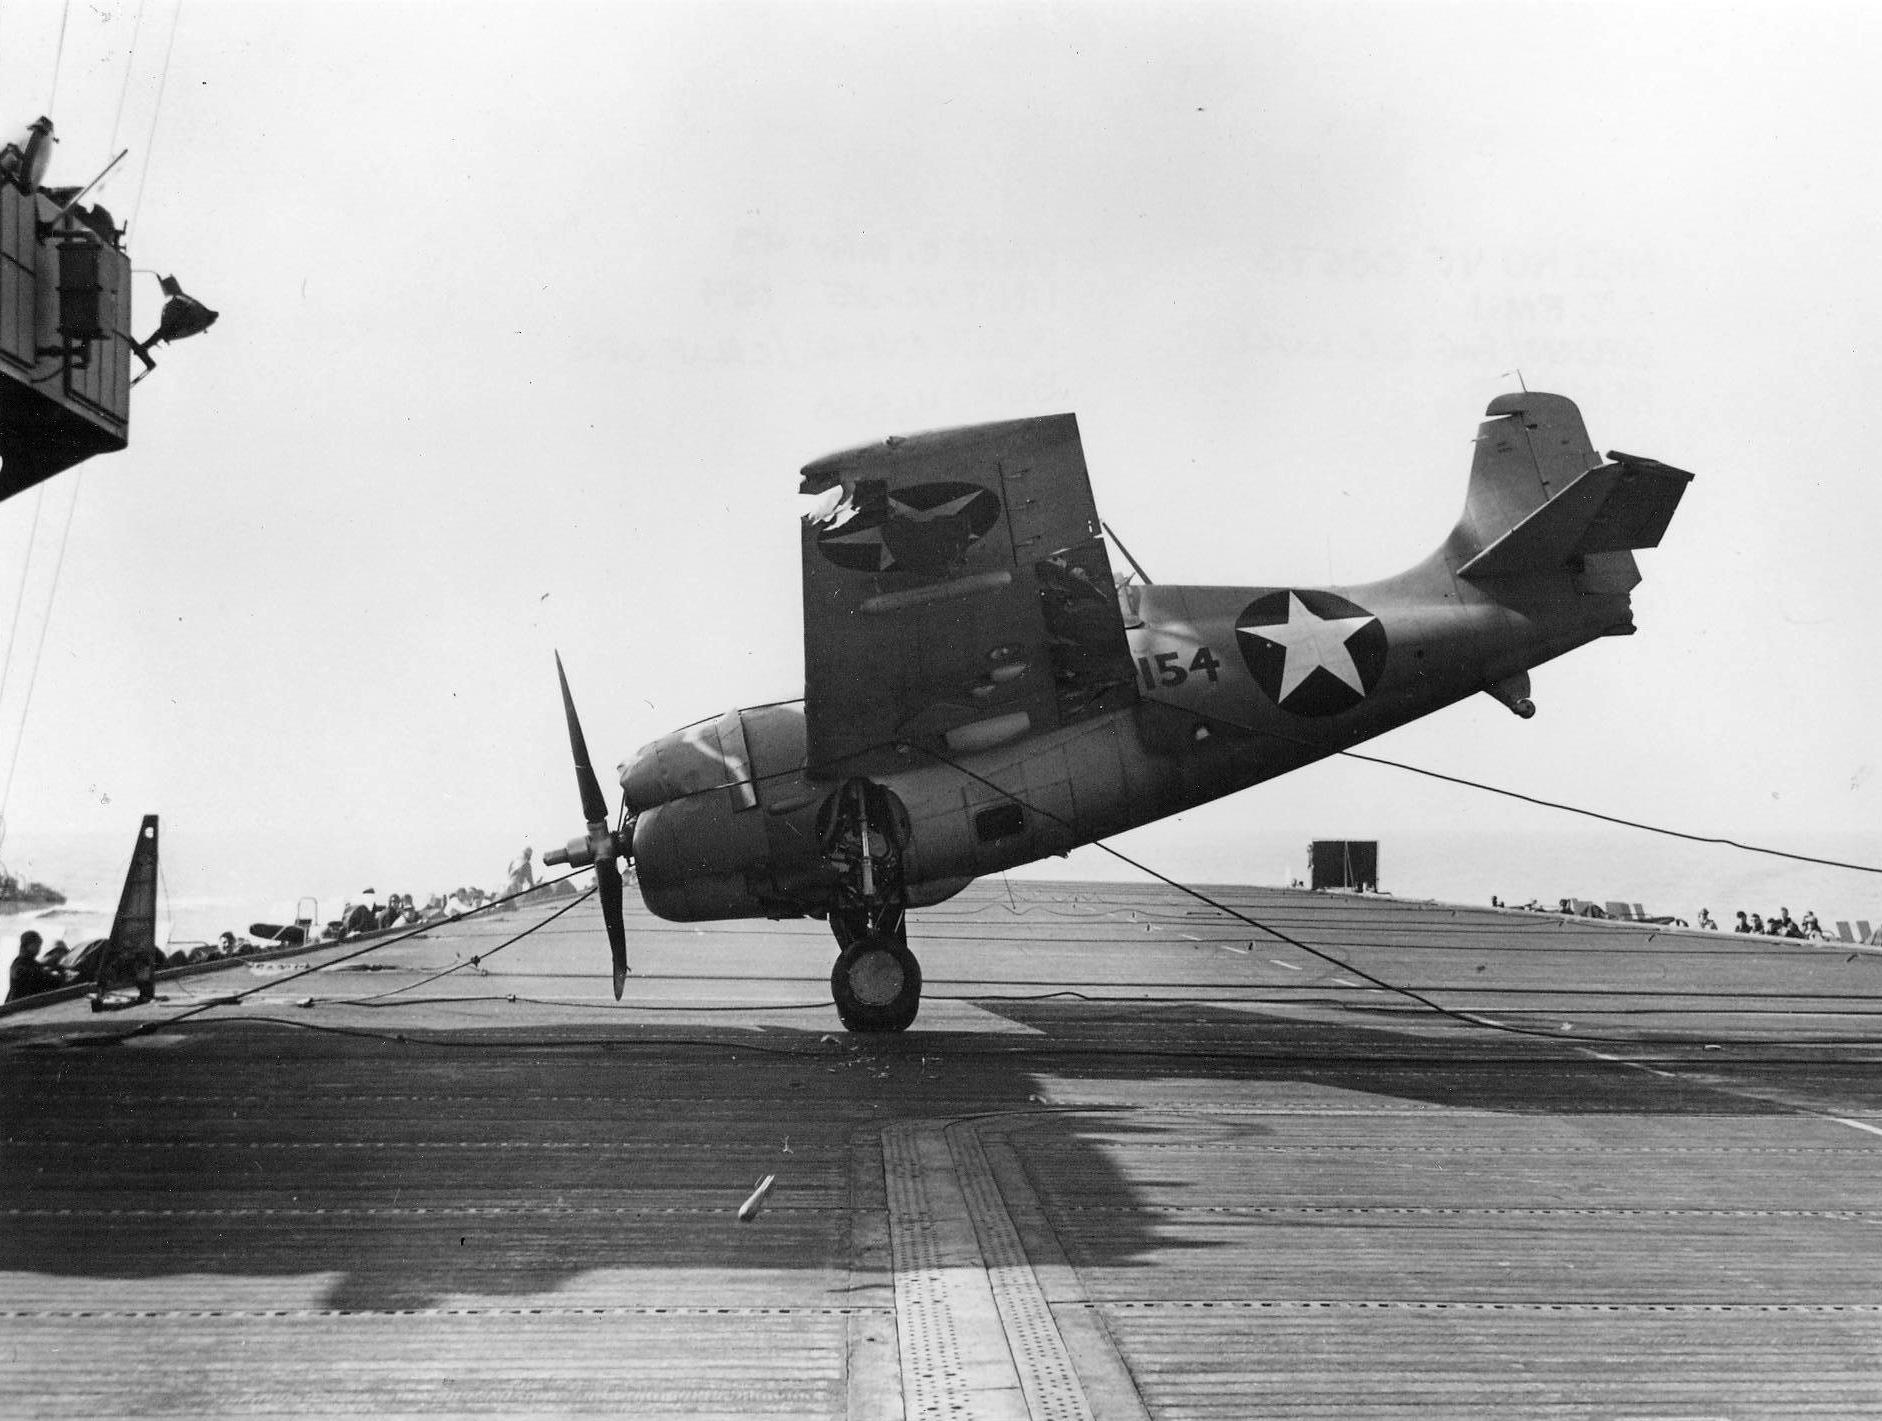 FM 1 Wildcat VC 25 Black 154 landing mishap CVE 21 USS Block Island 1943 01